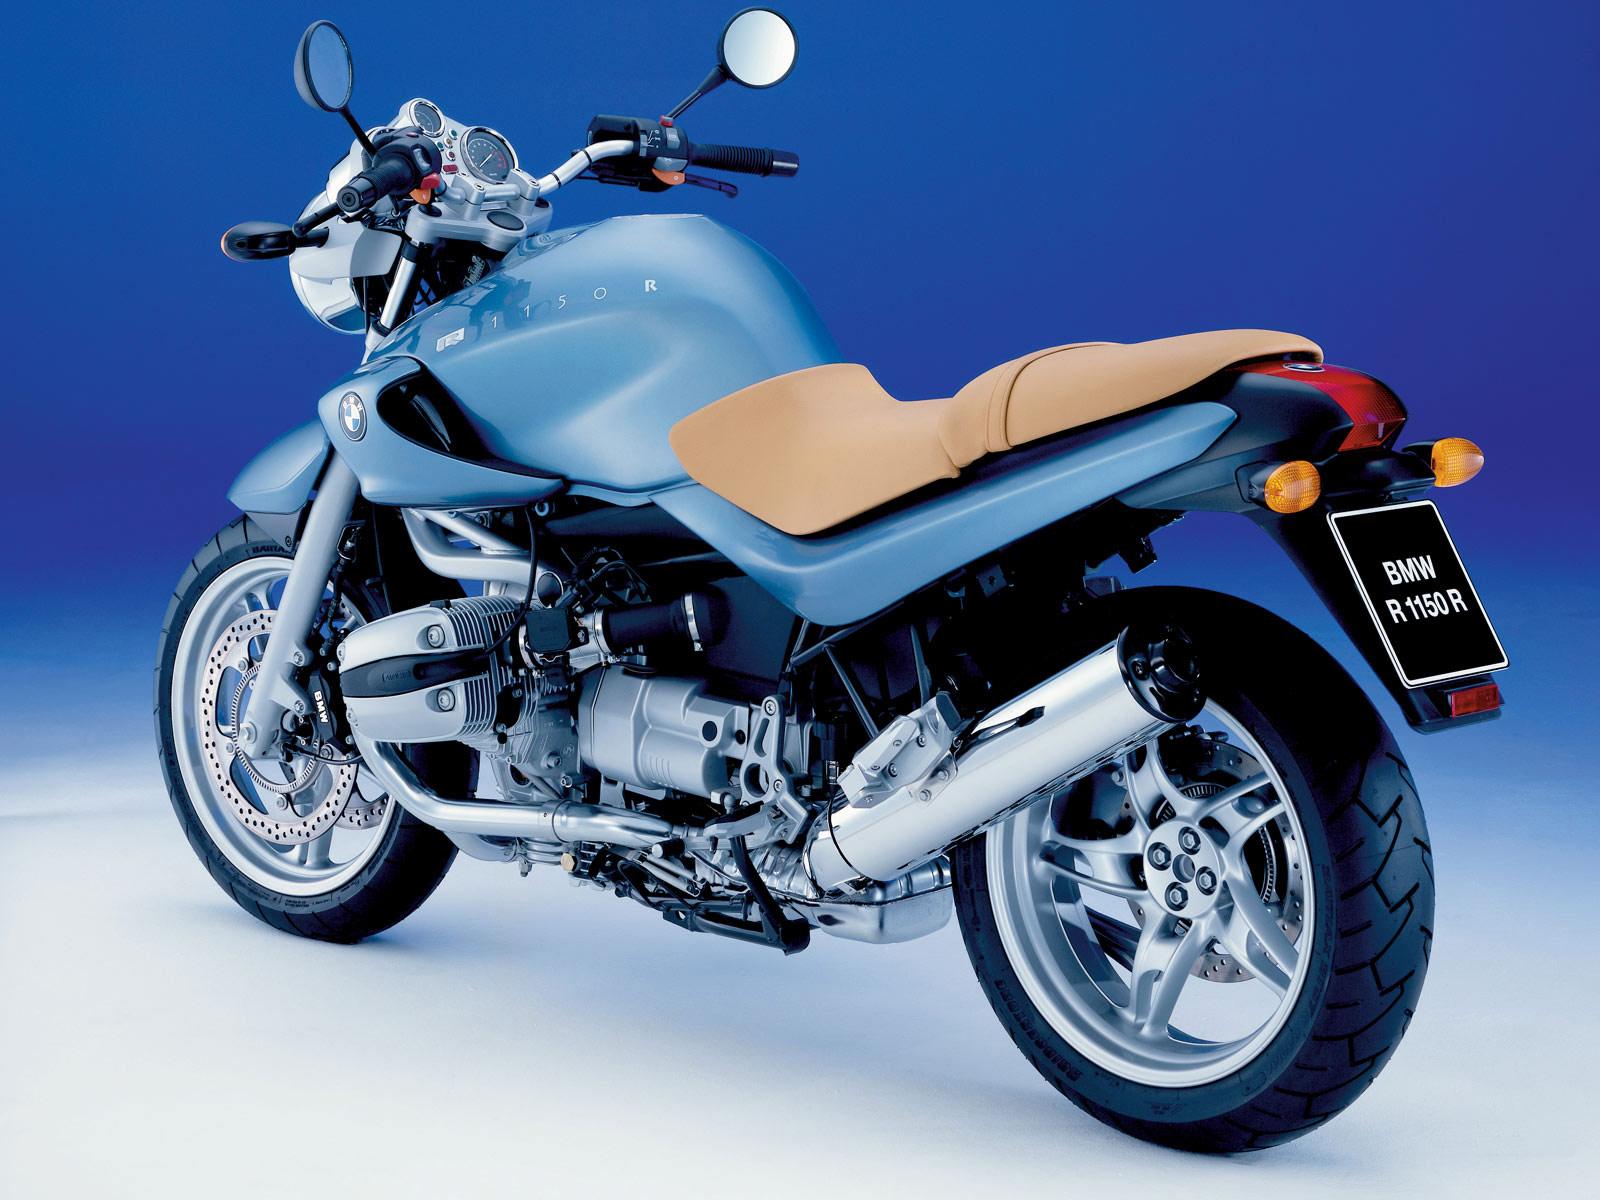 2000 bmw r1150r motorcycle pictures insurance information. Black Bedroom Furniture Sets. Home Design Ideas